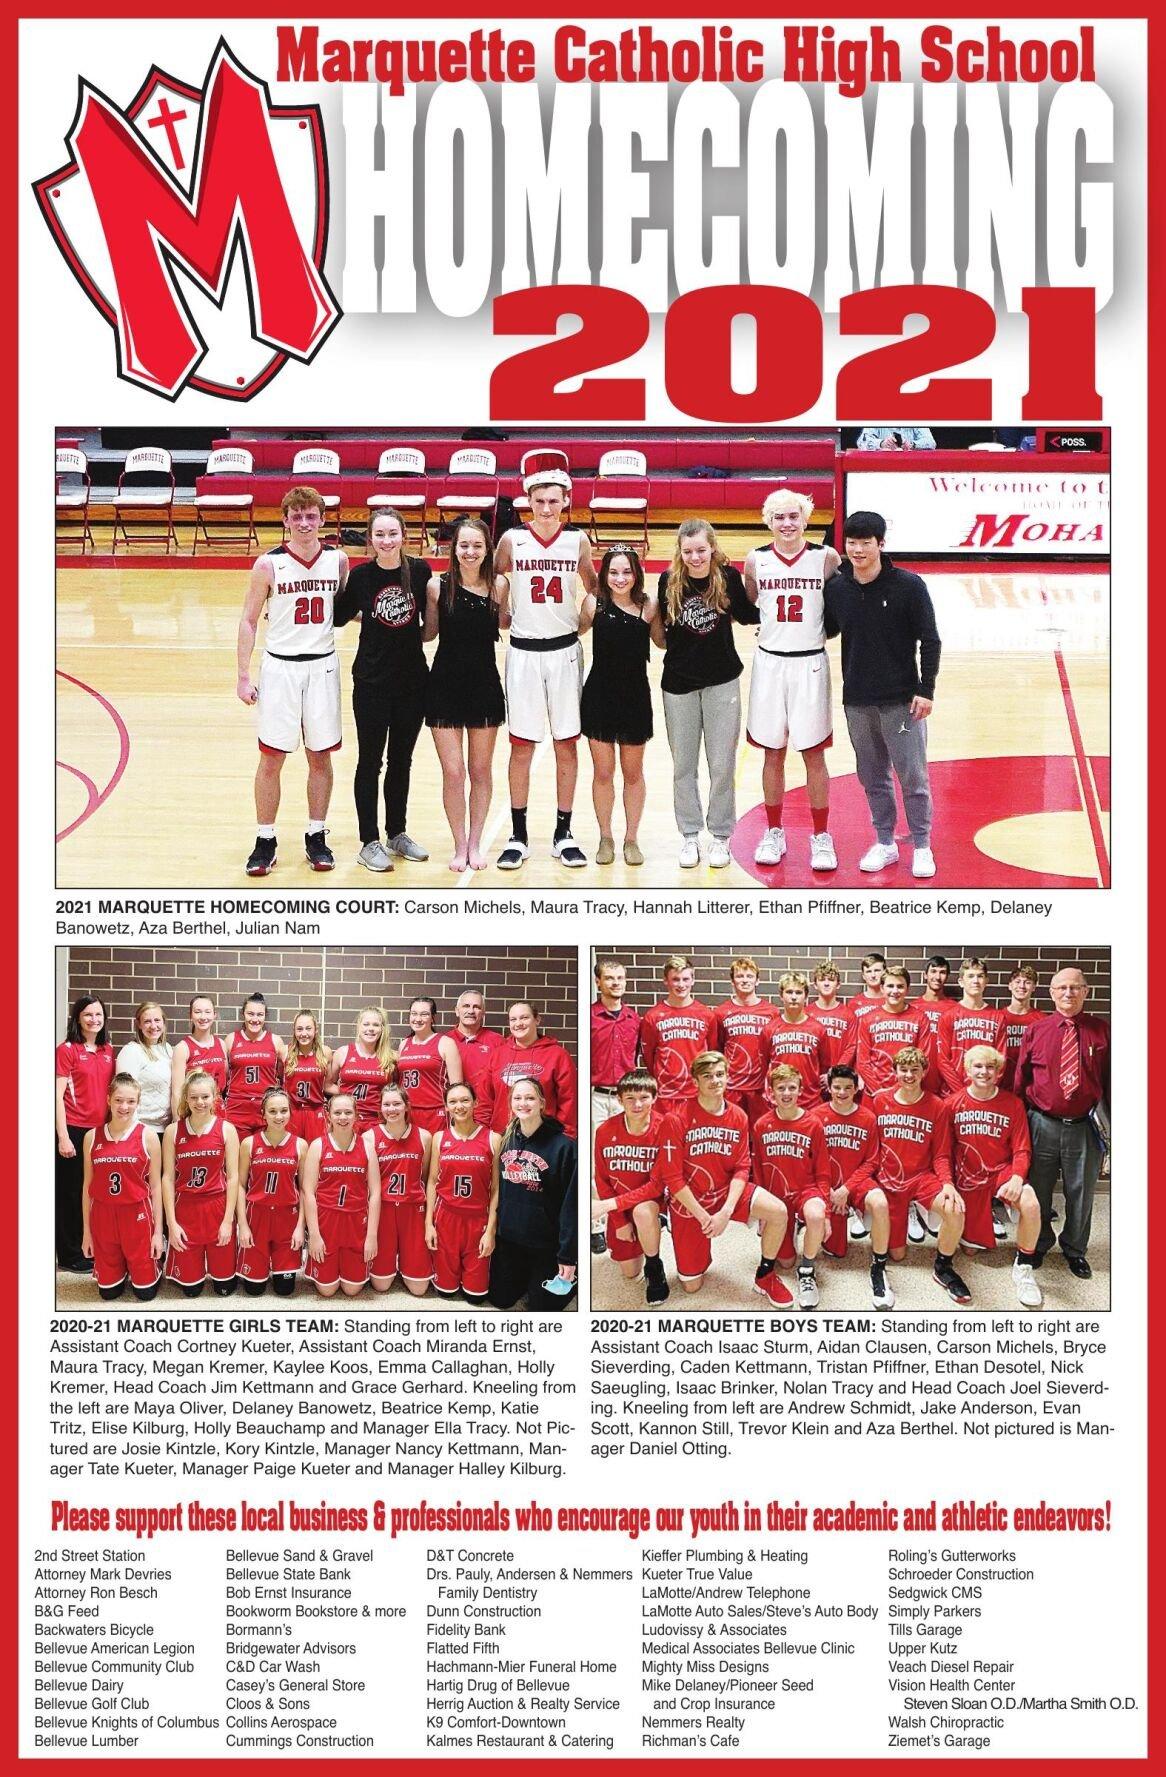 Marquette Catholic High School Homecoming 2021